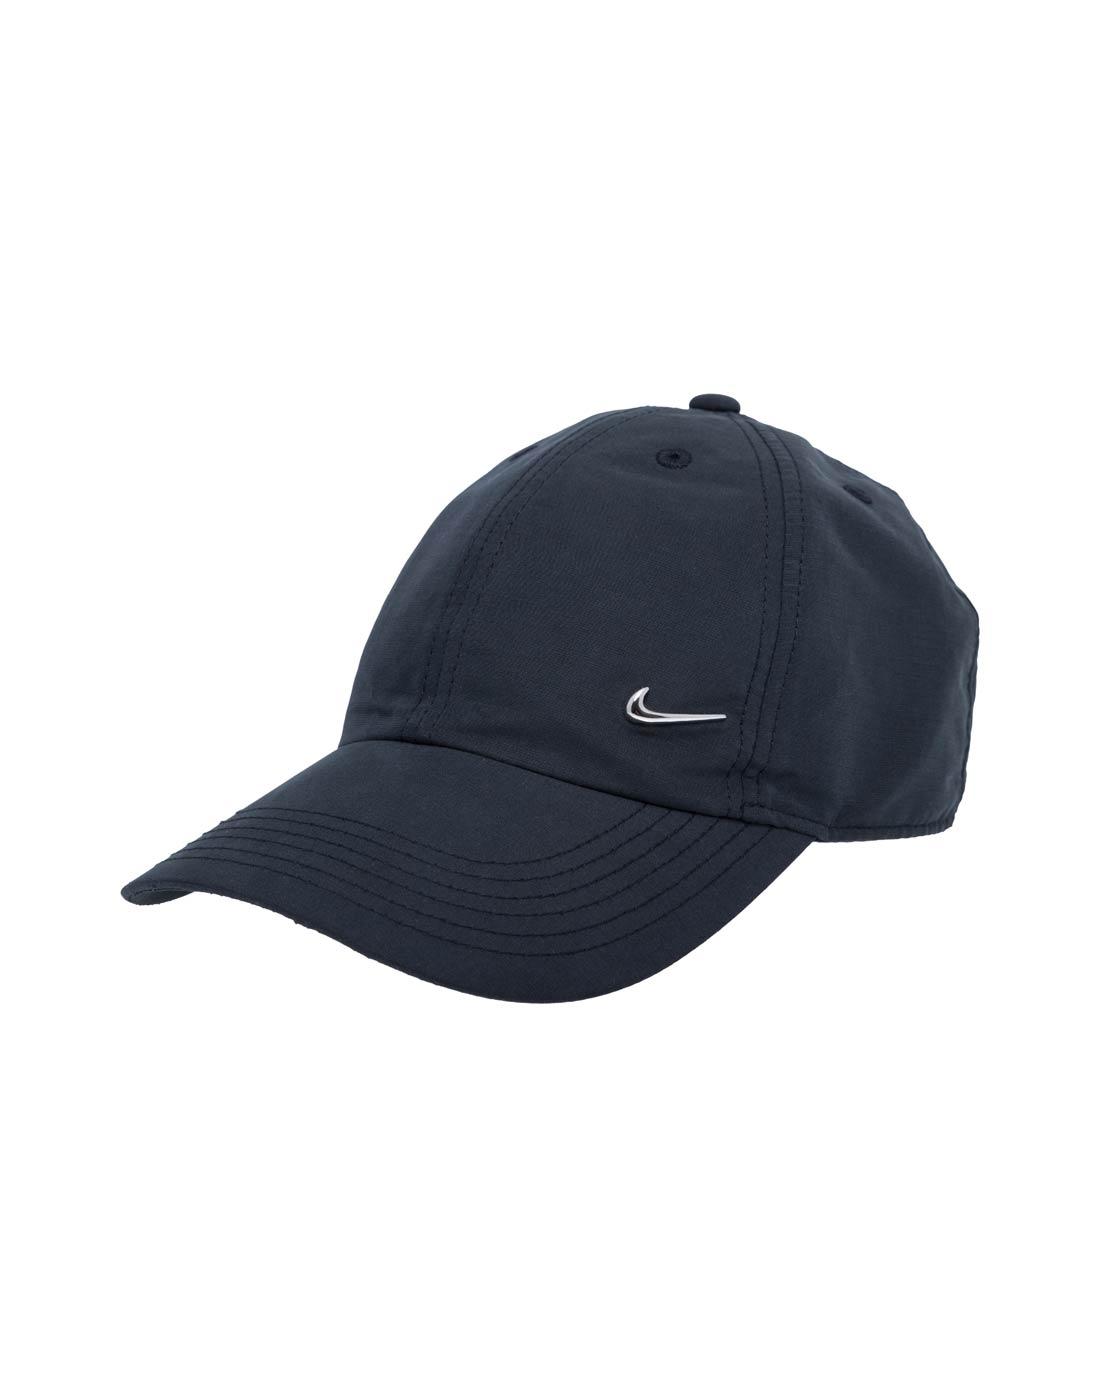 4c070715 Youth's Nike Metal Swoosh Cap | Black | Life Style Sports